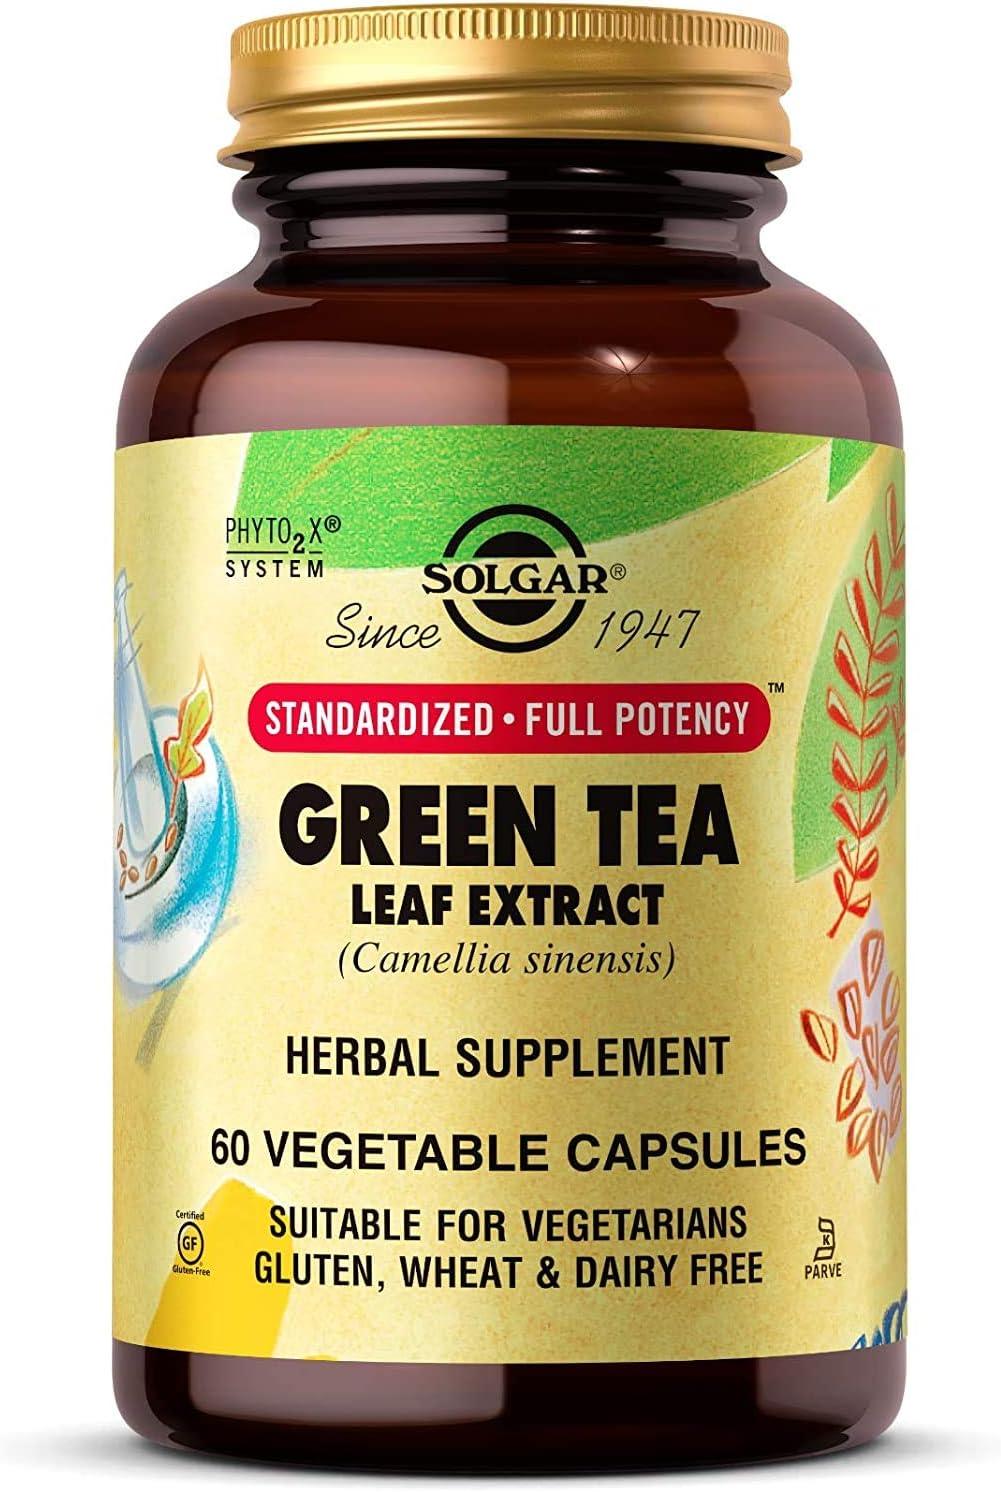 Solgar Standardized Full Potency Green Vegetabl Extract Tea Leaf Complete Free Shipping Nashville-Davidson Mall